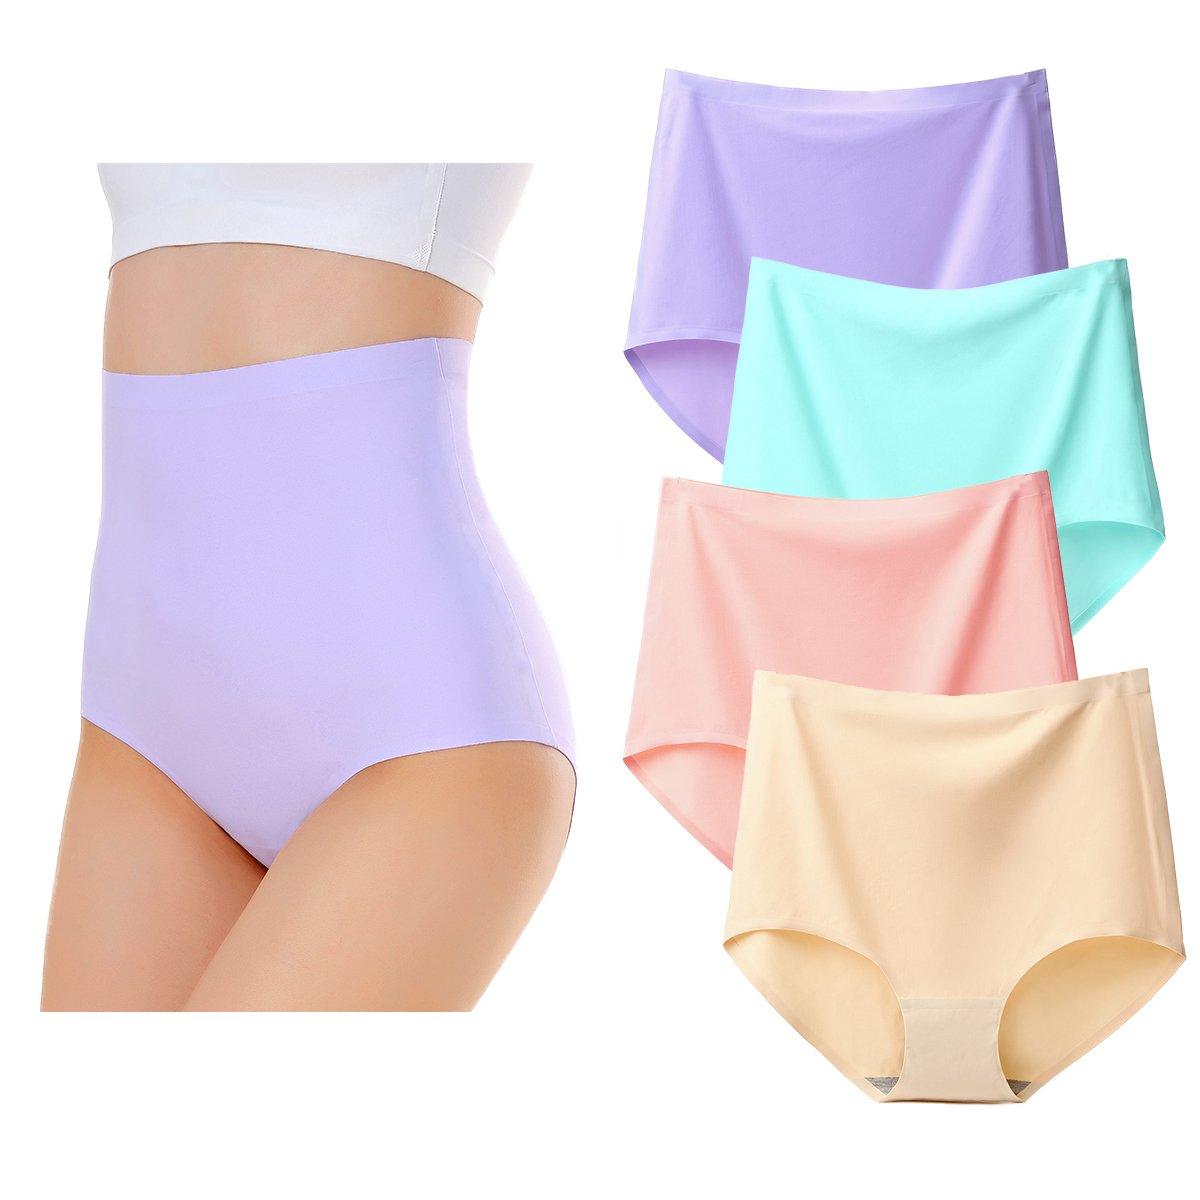 KISSLACE Women Casual Seamless Briefs High Waist Knickers Panties Plus Size 4 Pack KISSLACEjinnmyuk6272